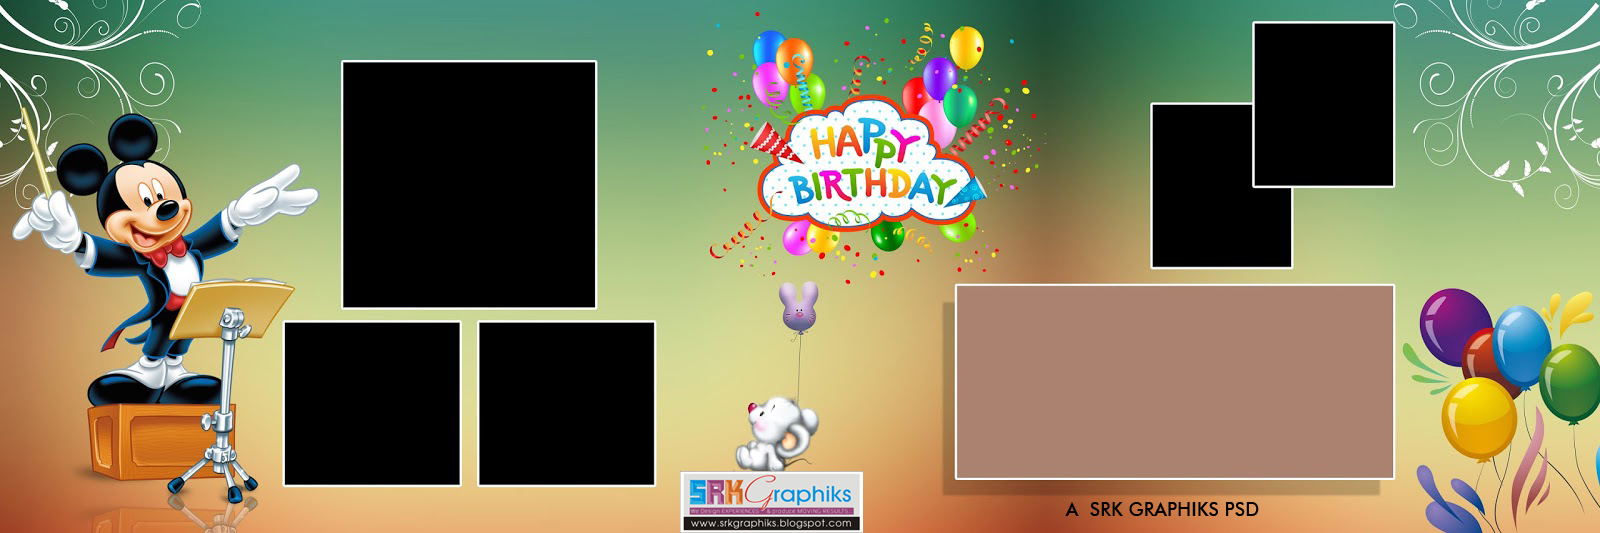 PSD 12 36 Karizma Birthday Album Templates SRK GRAPHICS